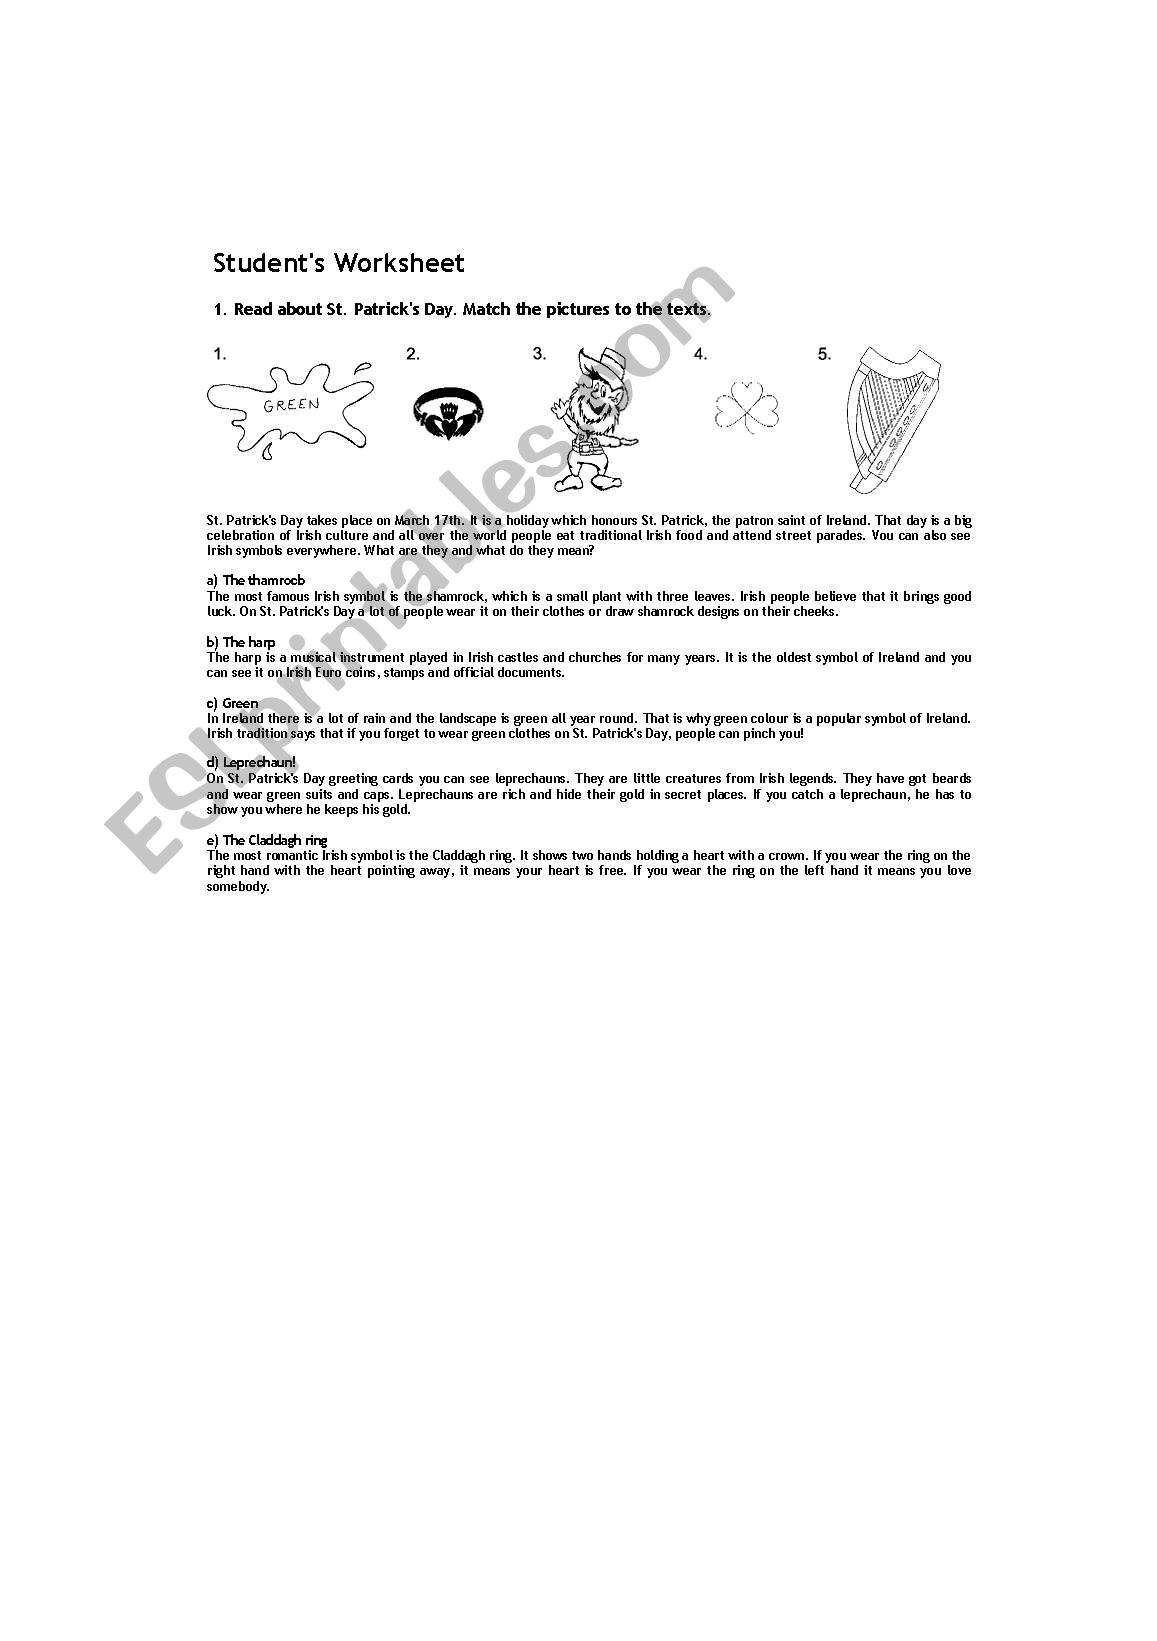 Worksheet For St Patrick S Day